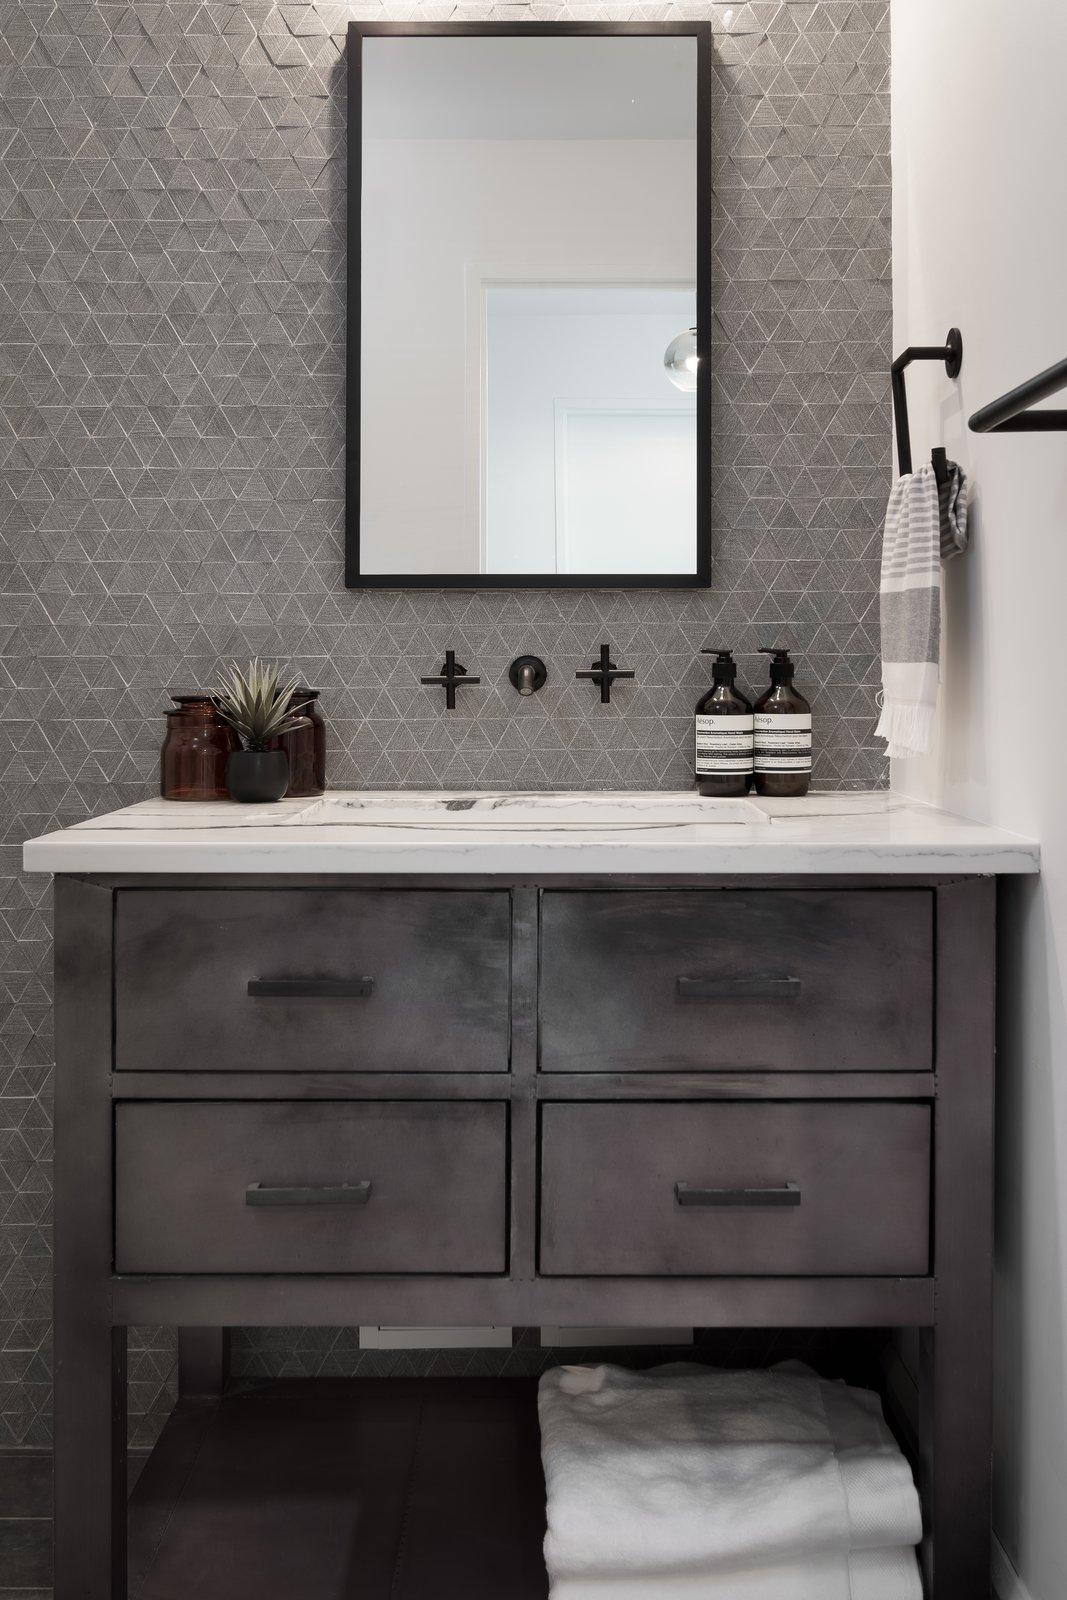 Eneia White Interiors bathroom